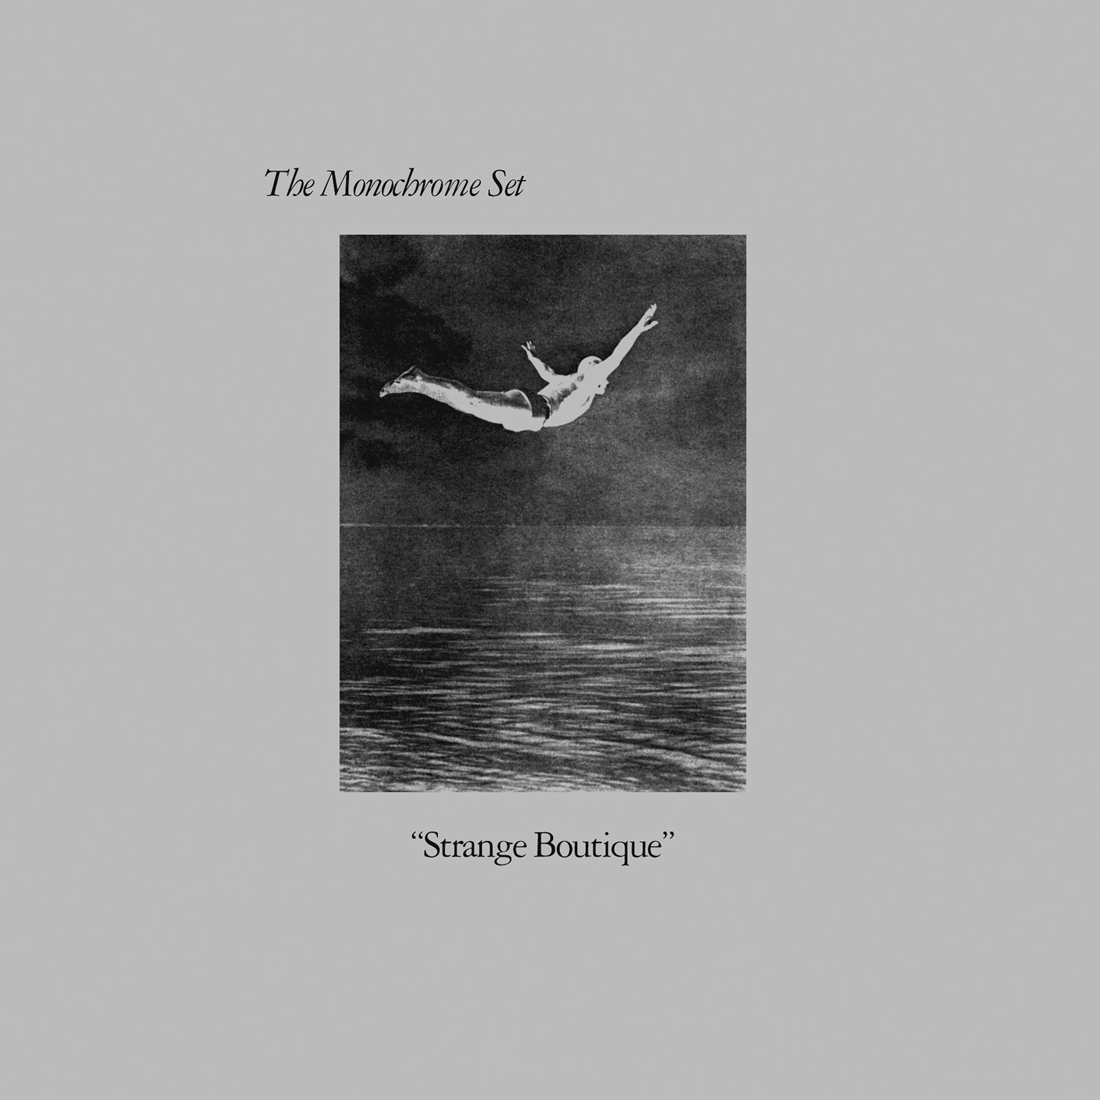 Peter Saville, The Strange boutique, the Monochrome SEt, DinDiscAlbum, 1980,